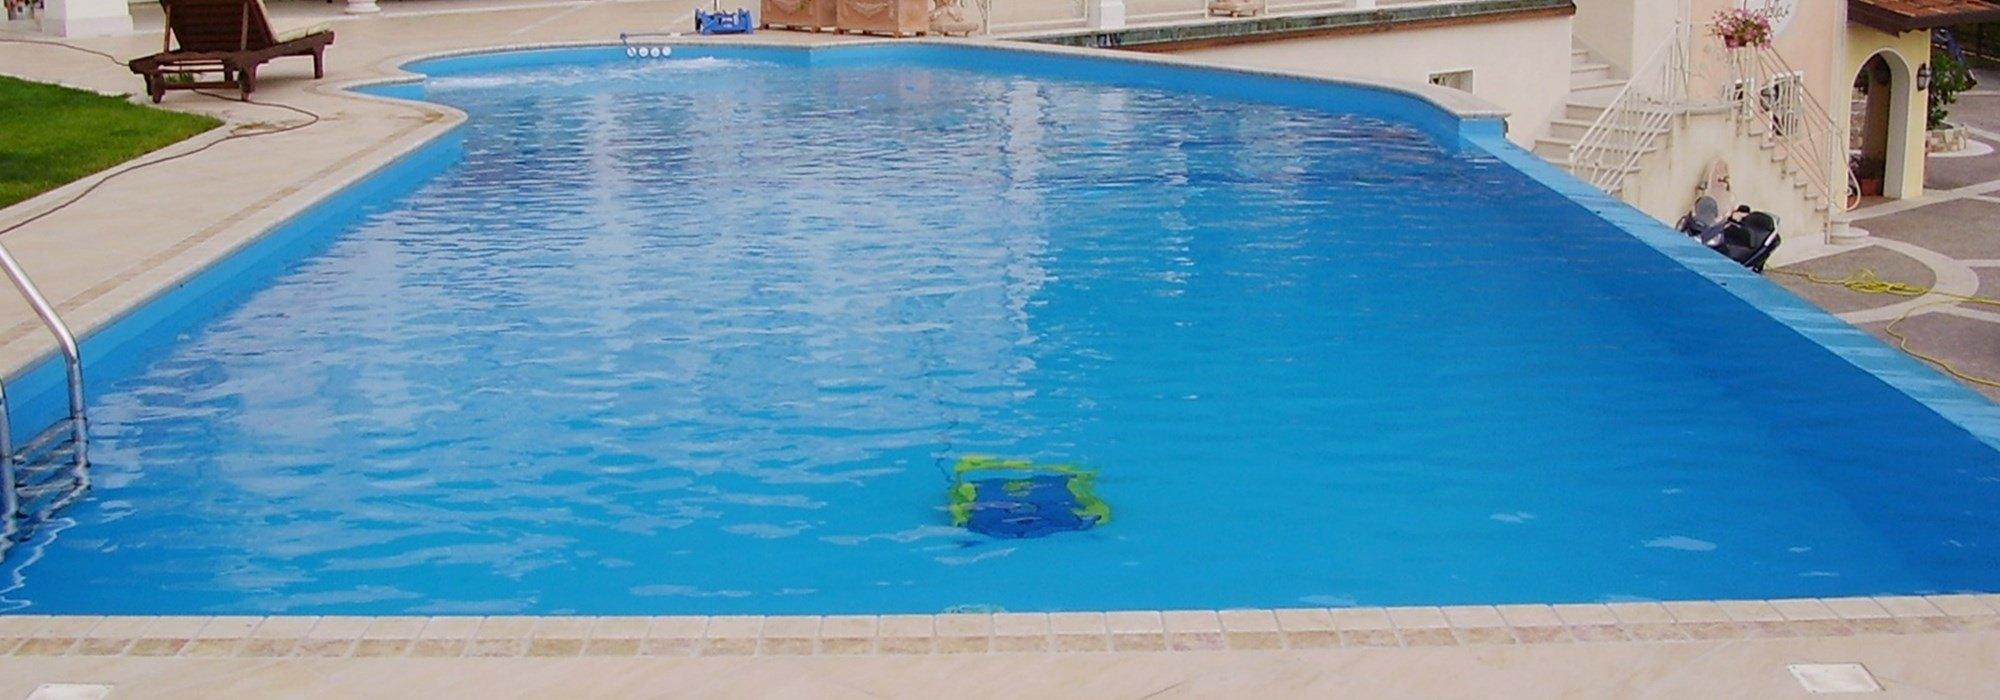 robot piscina professionale